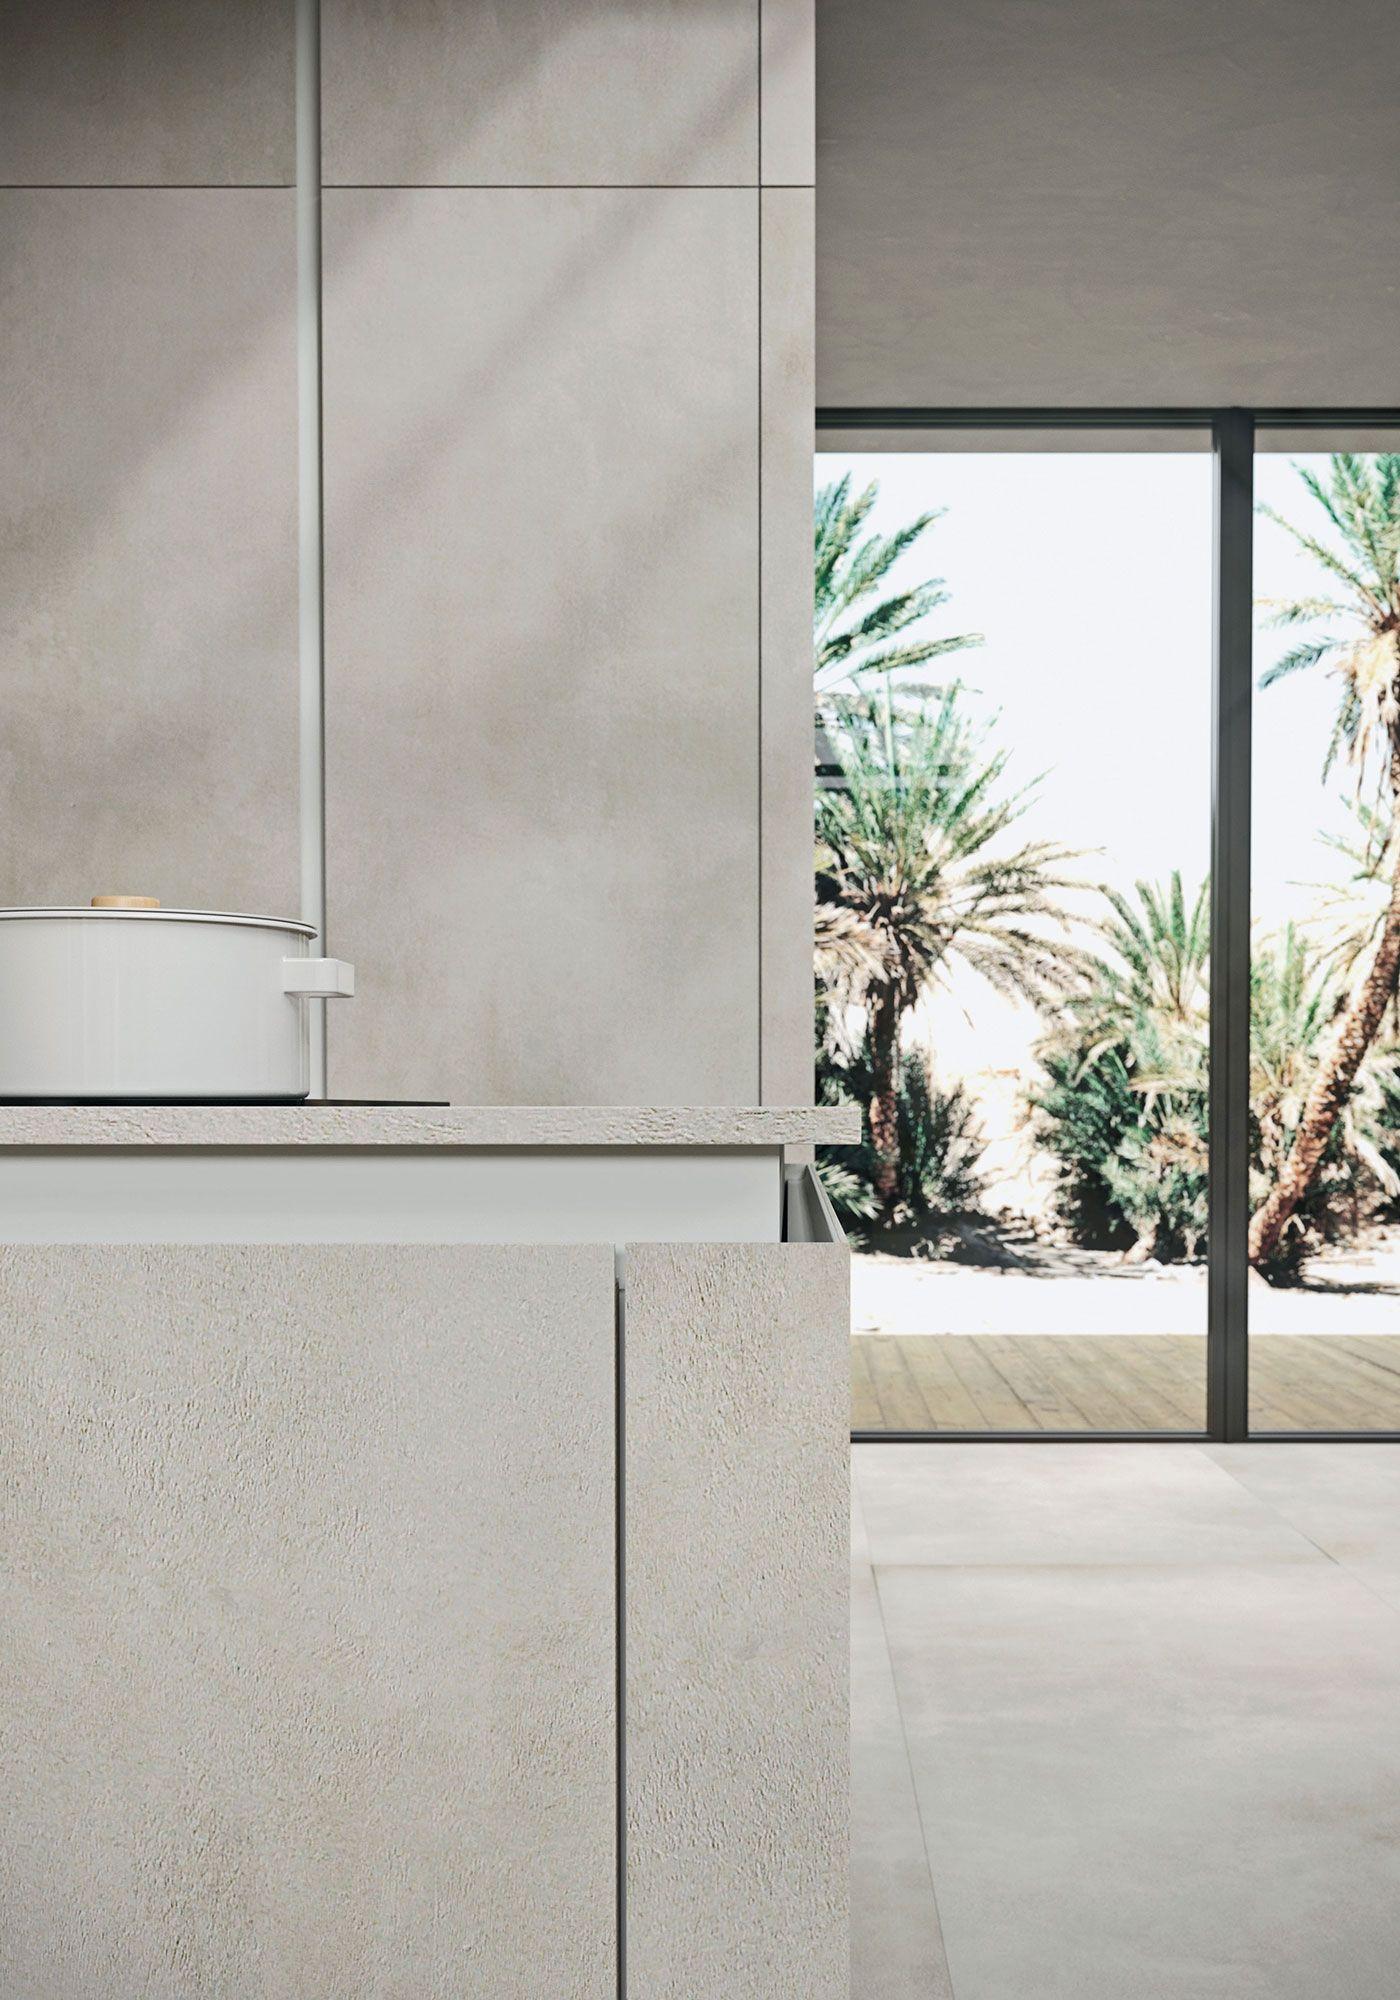 Dettaglio su cucine design Snaidero - Way Materia - foto 2 | Кухня ...